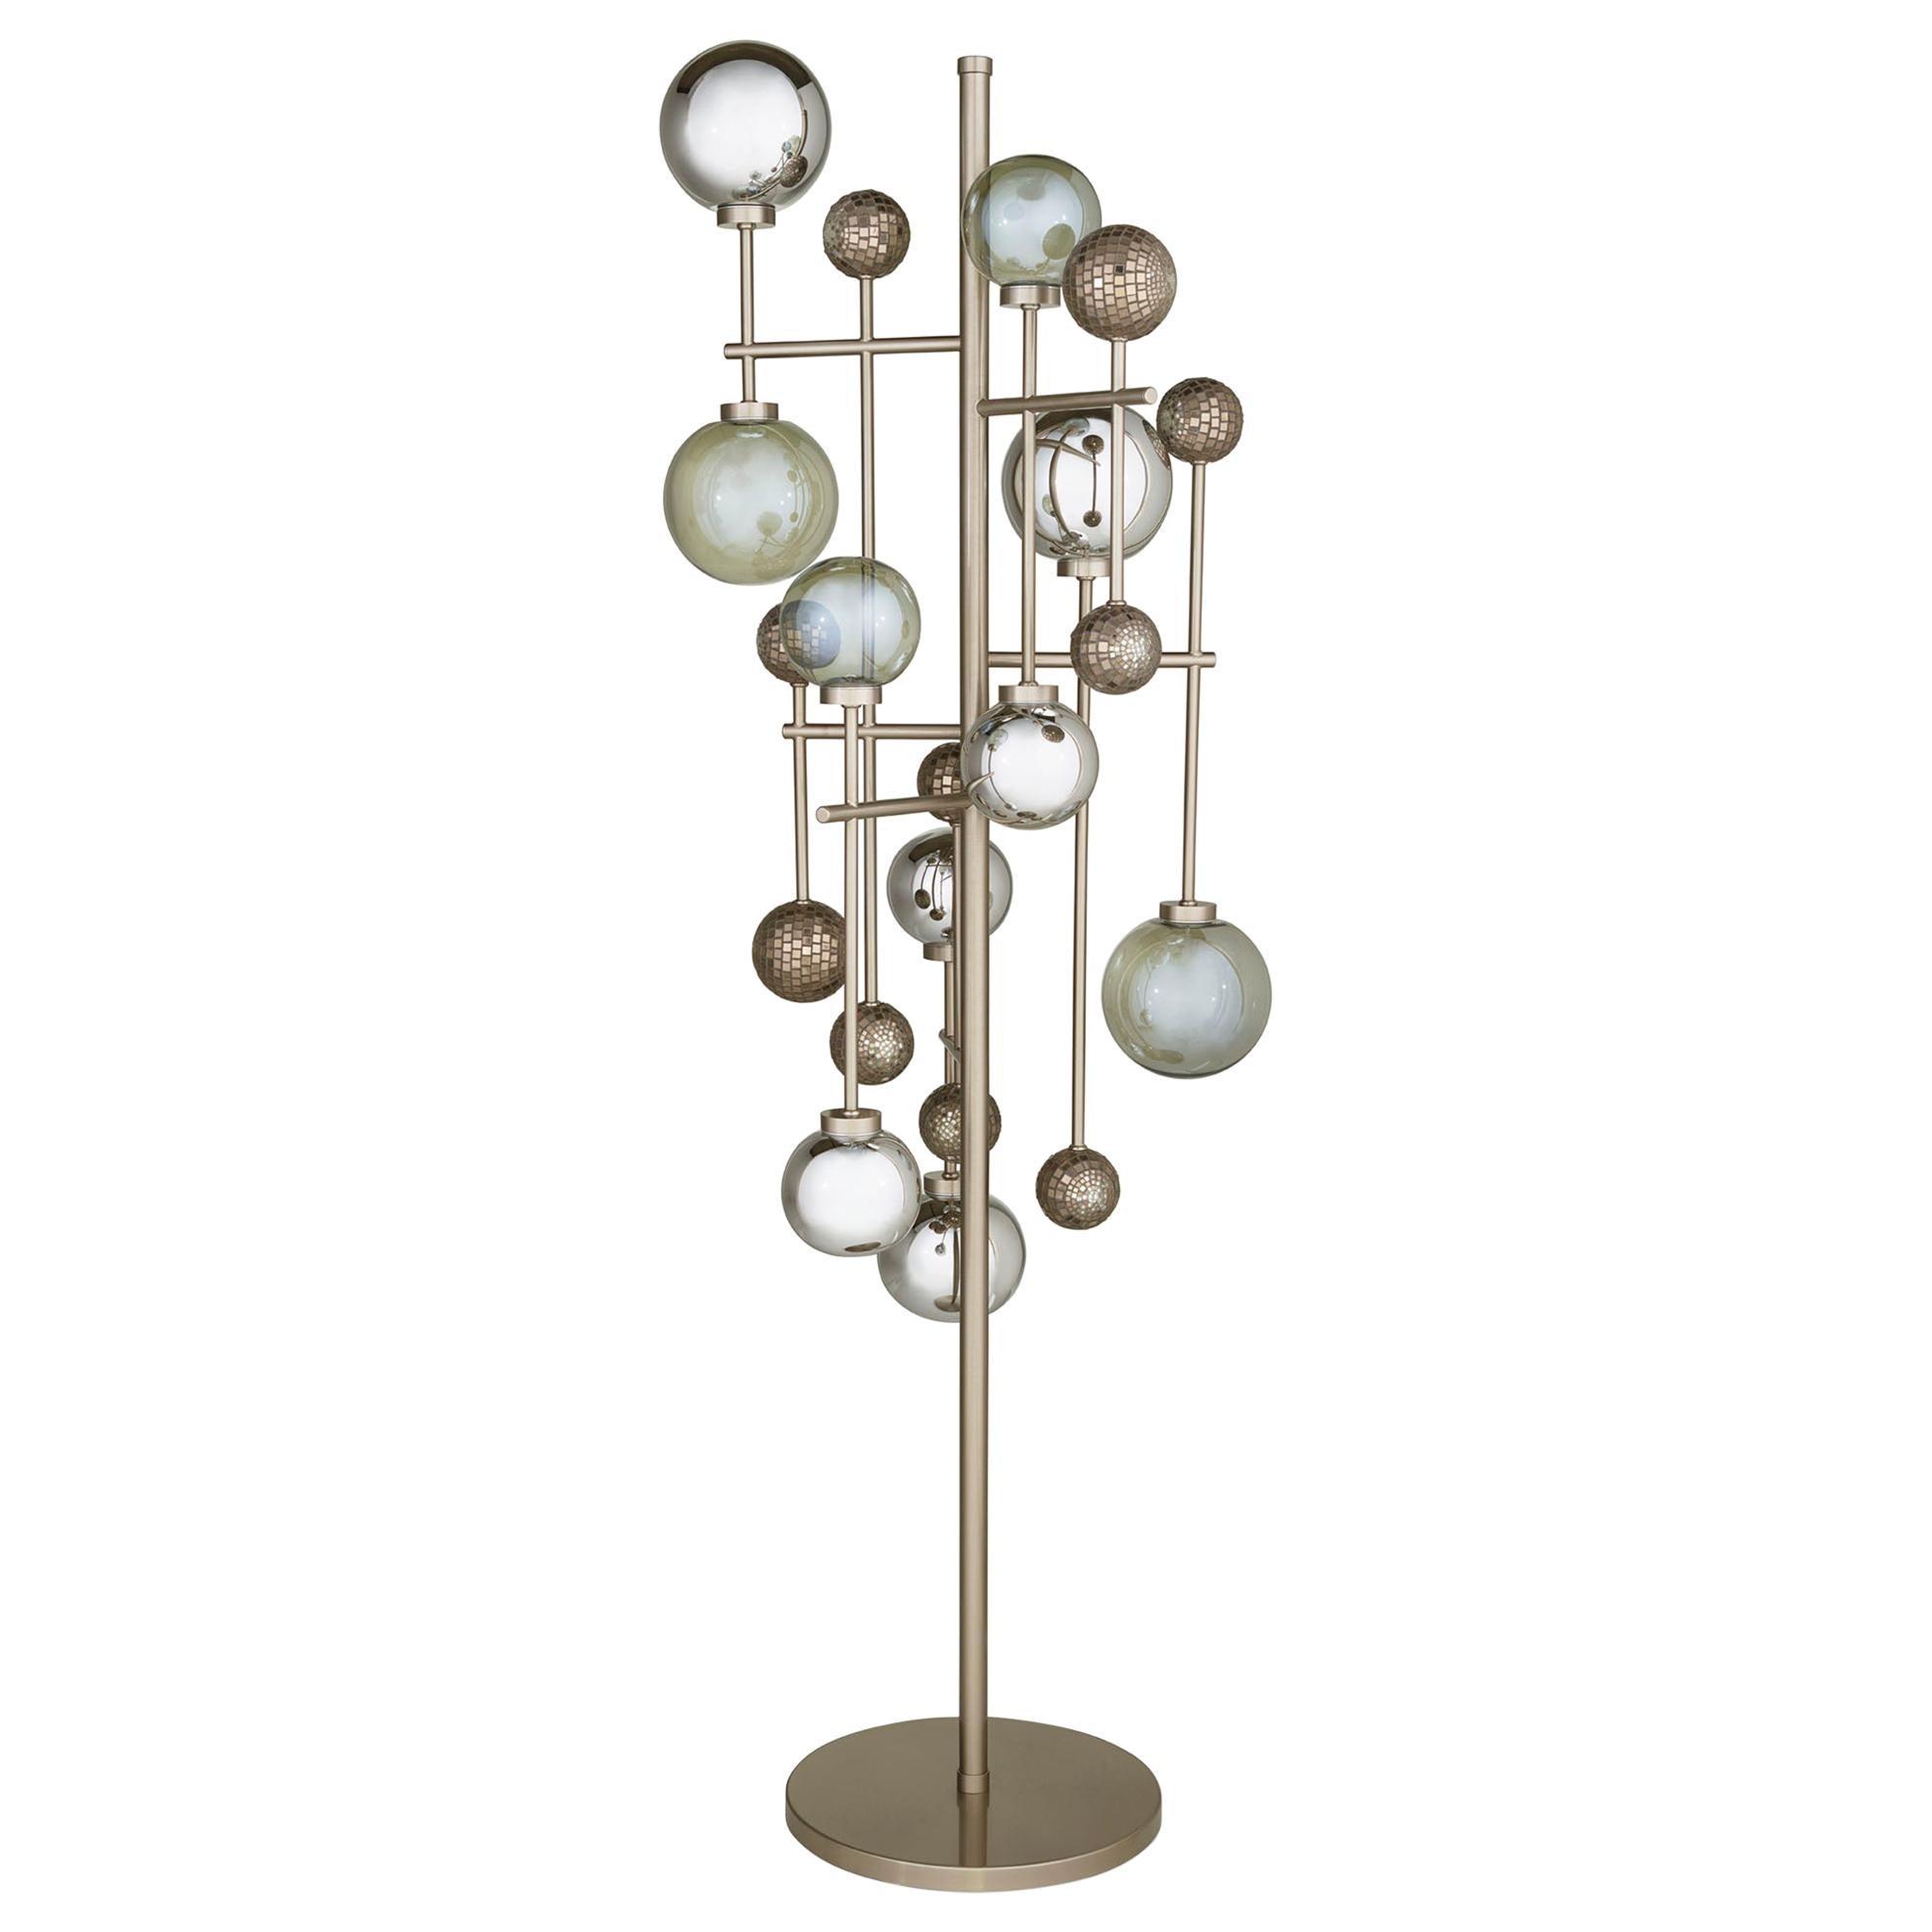 Floor Lamp Brass Frame Nickel or Brass Finish Glass Spheres Artistic Mosaic